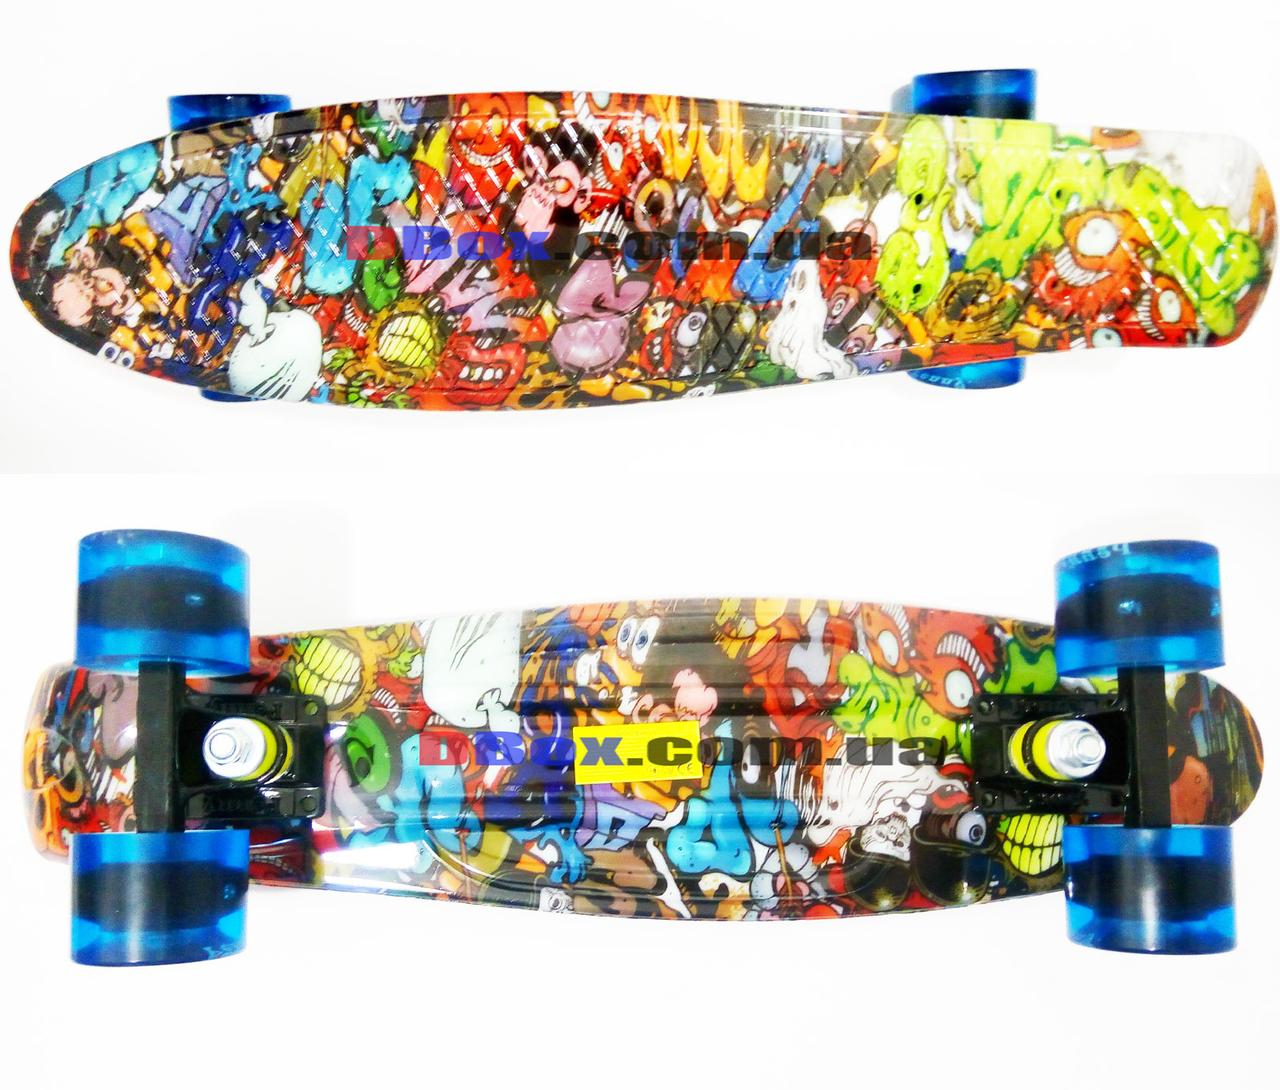 "Скейт Пенни борд Penny Style LUX 22"" с рисунком + оригинальная гравировка Penny  Матовые, Monsters (2T2035/WM/MS)"